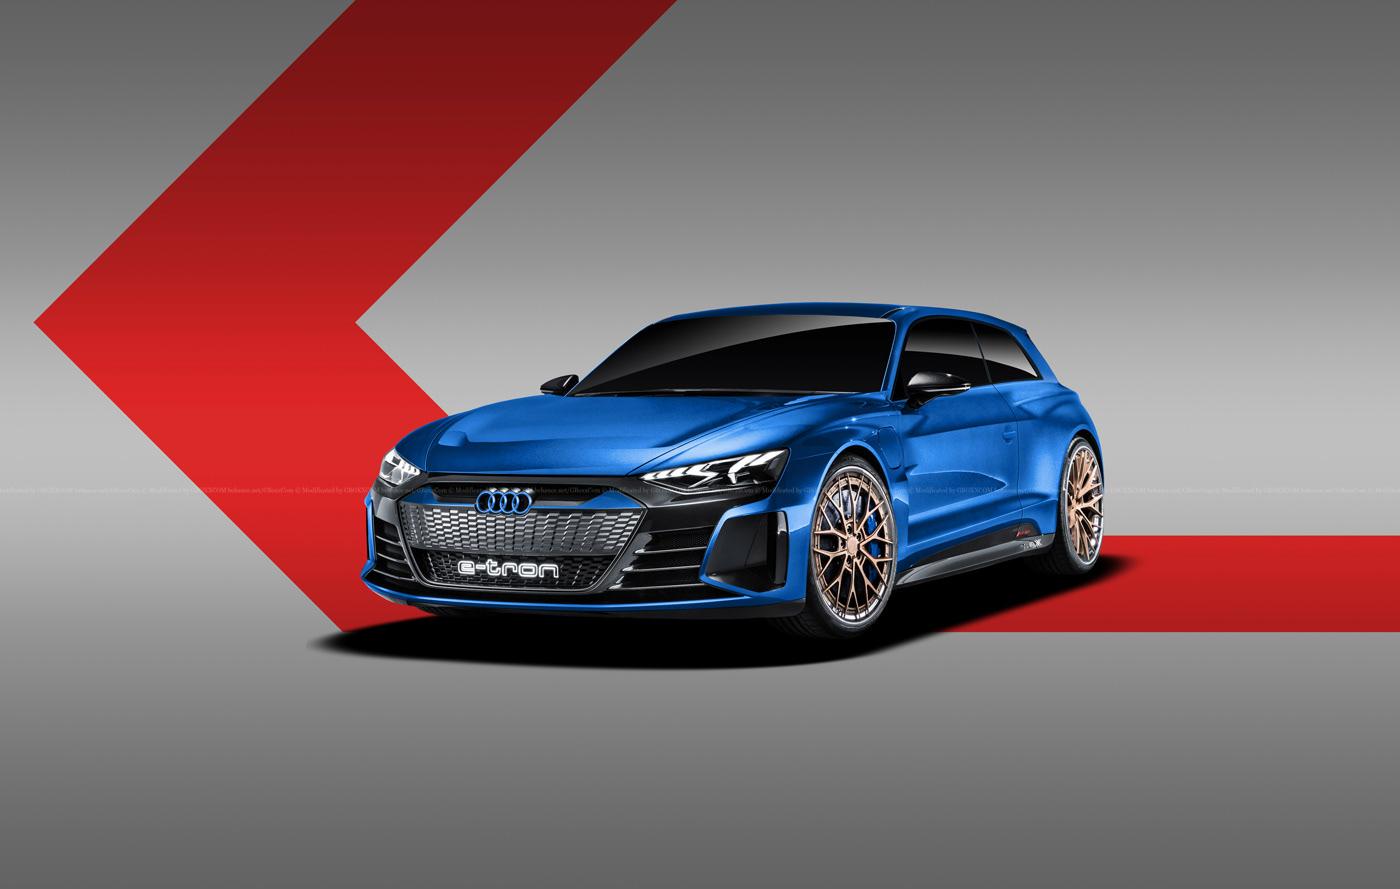 Audi E-Tron GT Spyder, E-Tron GT Wagon, E-Tron GT Coupe Renderings (7)